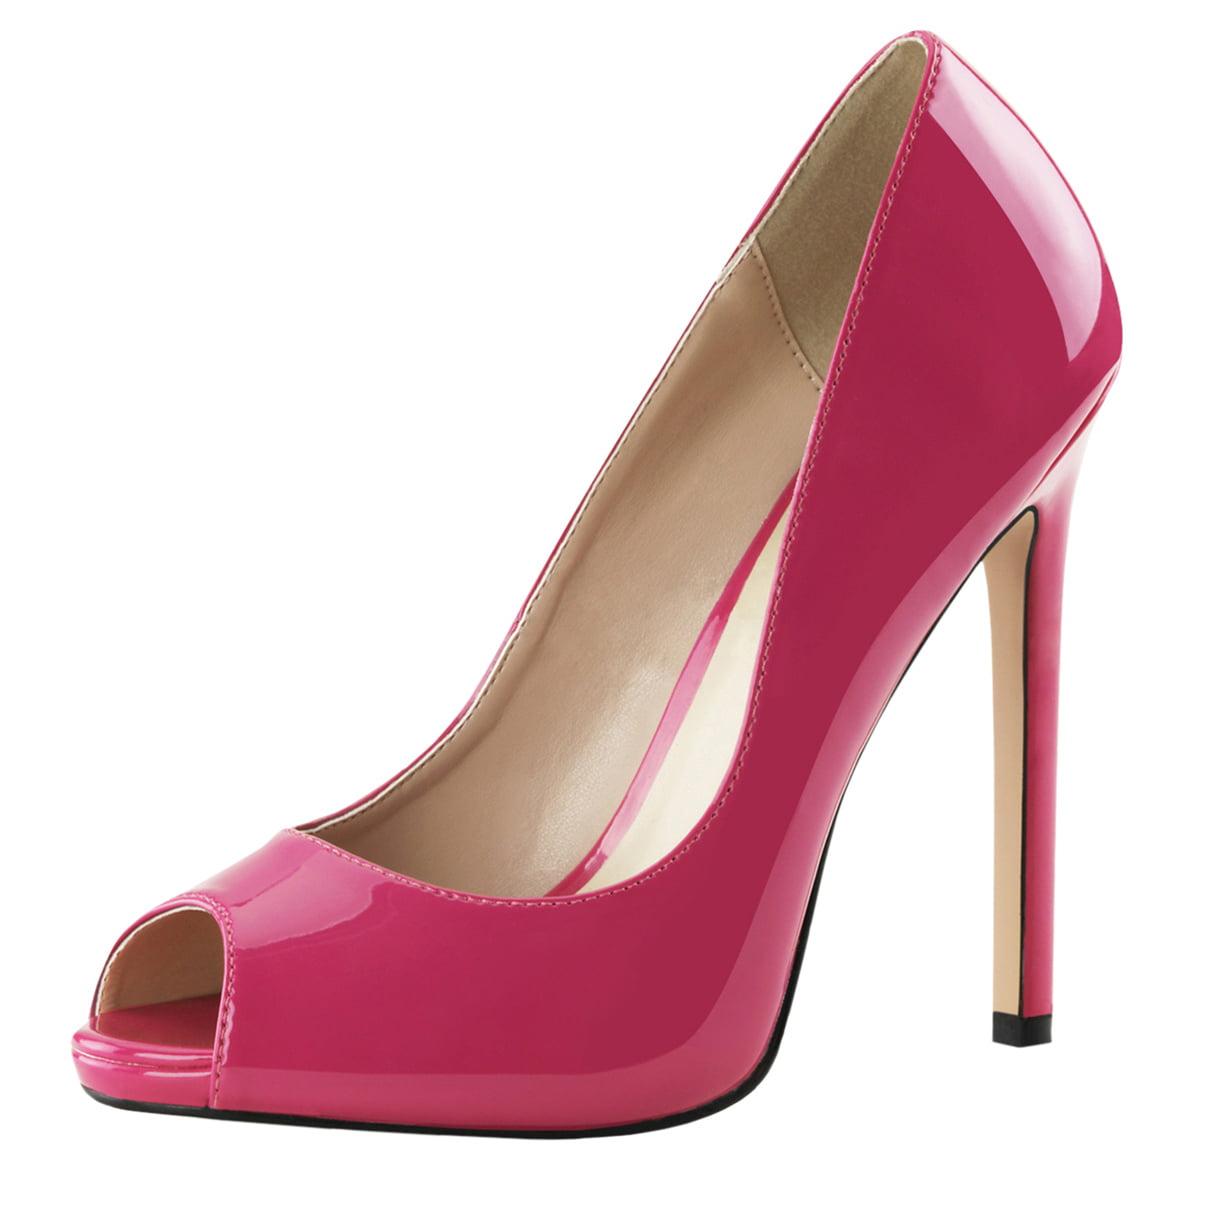 Womens Peep Pink Toe Pumps Patent Hot Pink Peep Shoes Platforms Stilettos 5 Inch Heels<New Road Map<Gentleman/Lady cb1925